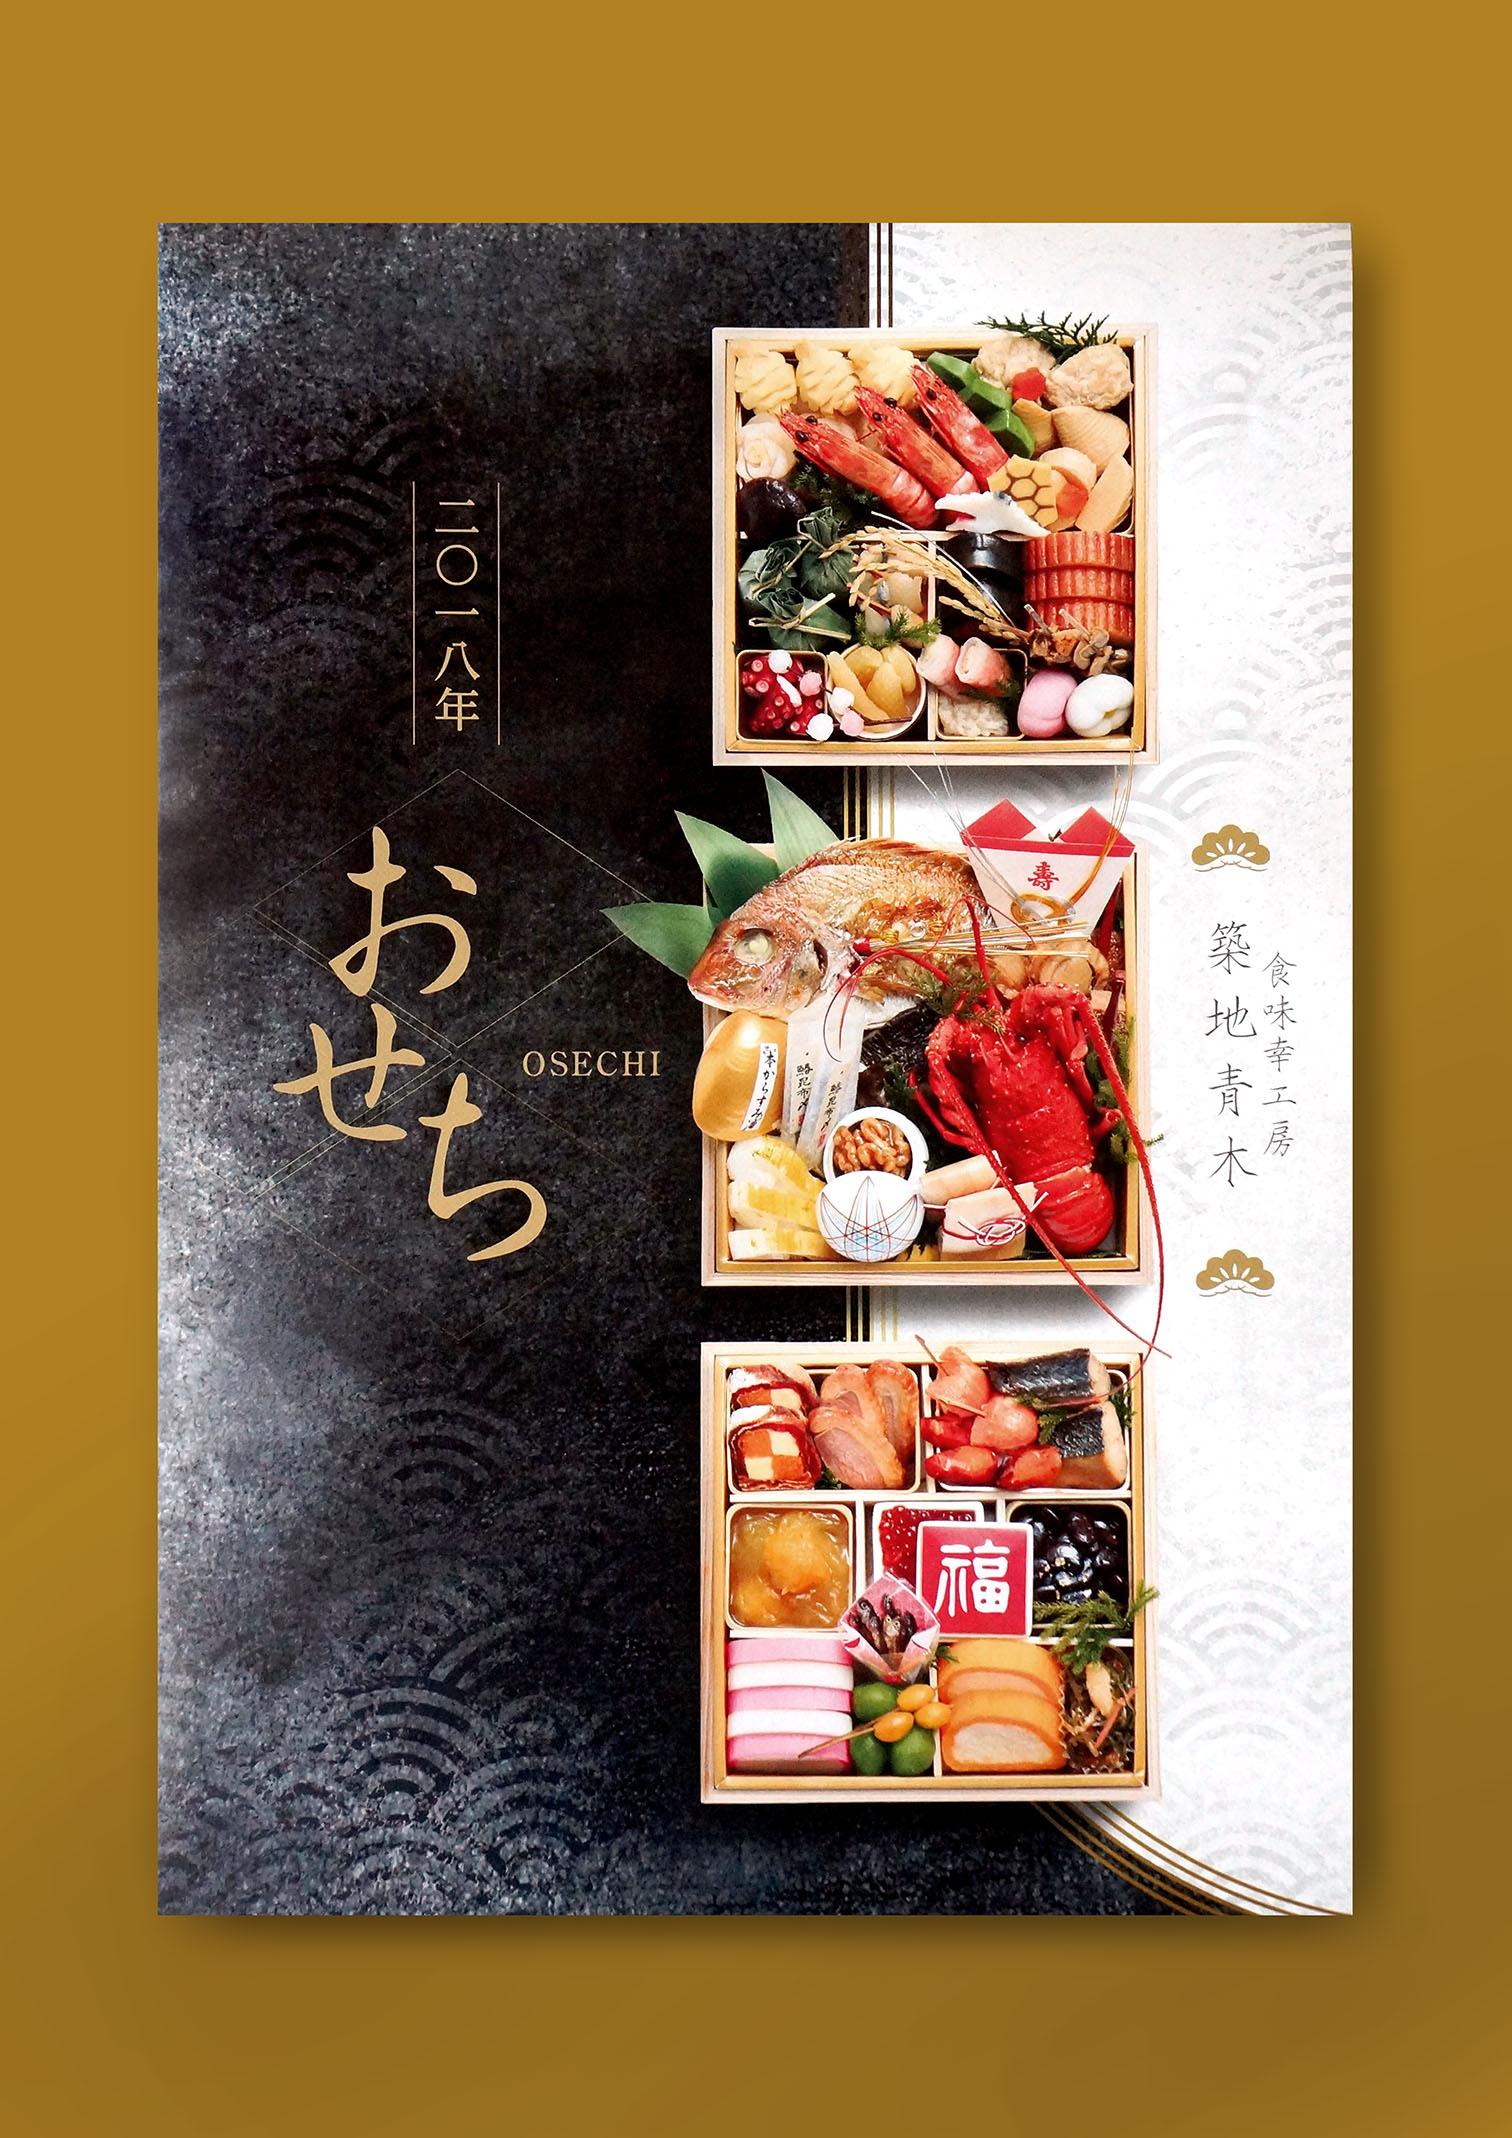 aoki_osechi2018_1